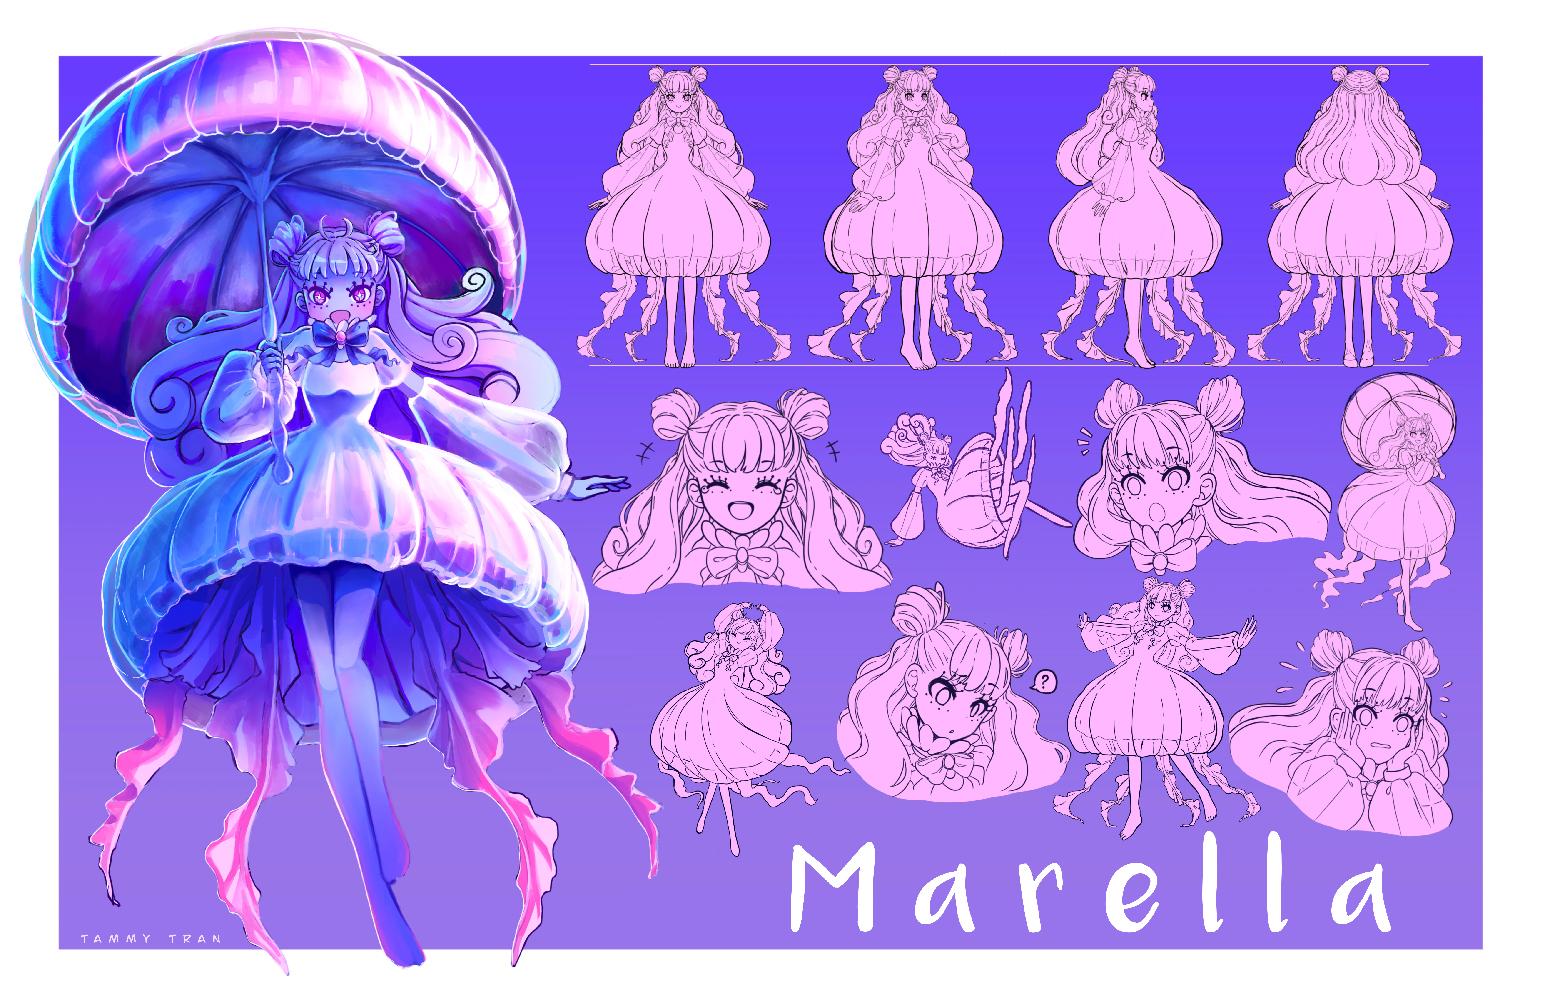 Sea Creature Design - Jellyfish Protagonist